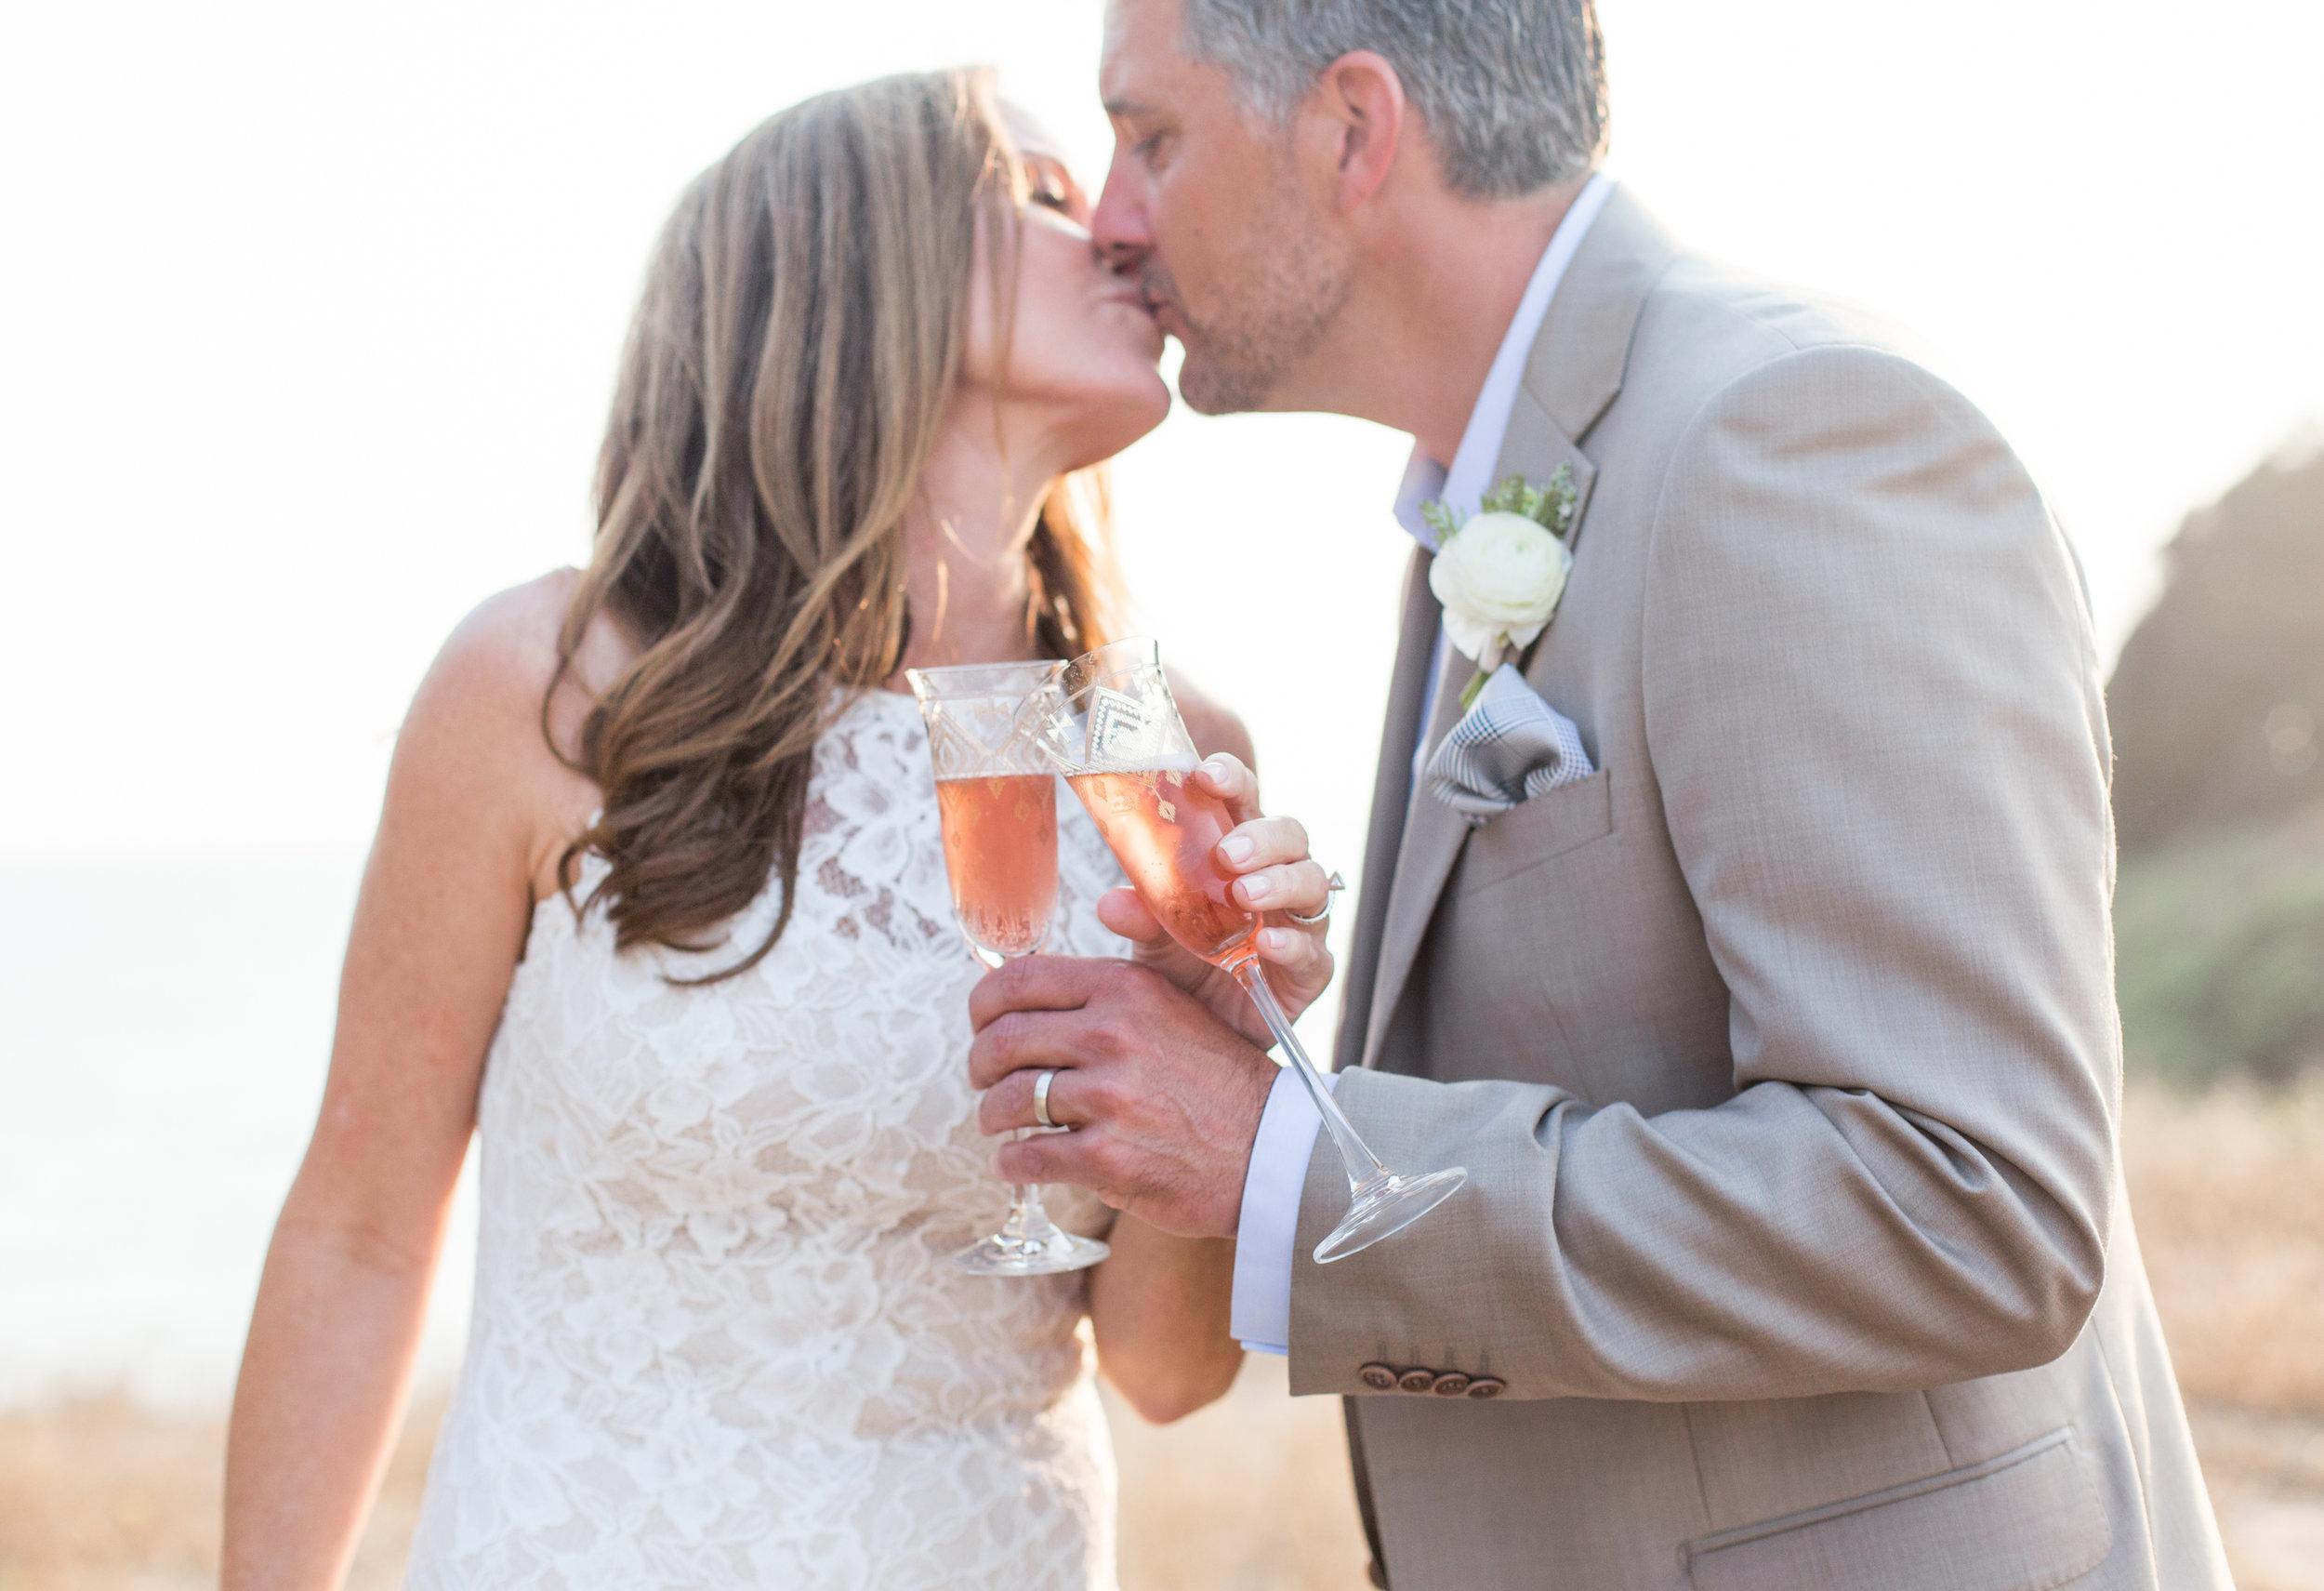 santa-barbara-elopement-elope-wedding-planner-coordinator-coordination-day-of-intimate-rustic-ellwood-bluffs-forest-beach-ocean-view-green-white-event (12).jpg